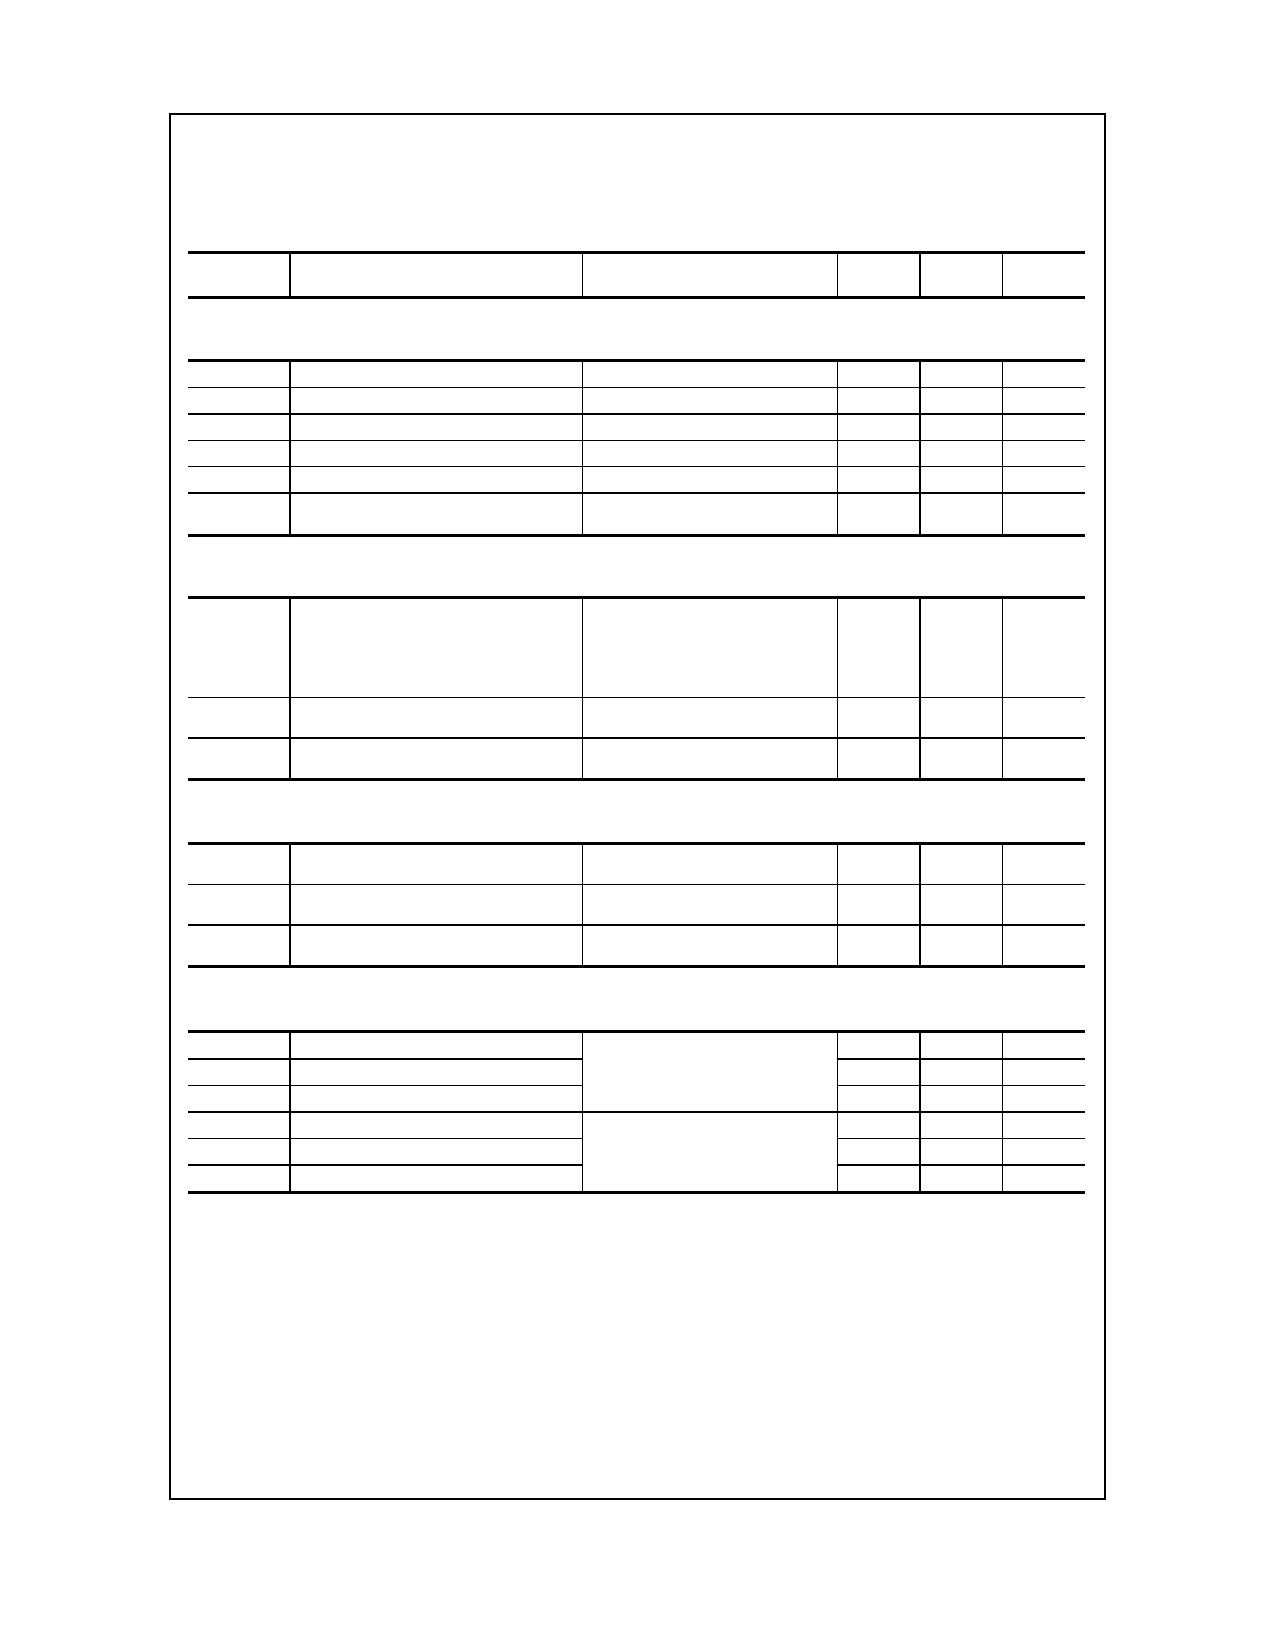 TN2905A pdf, schematic